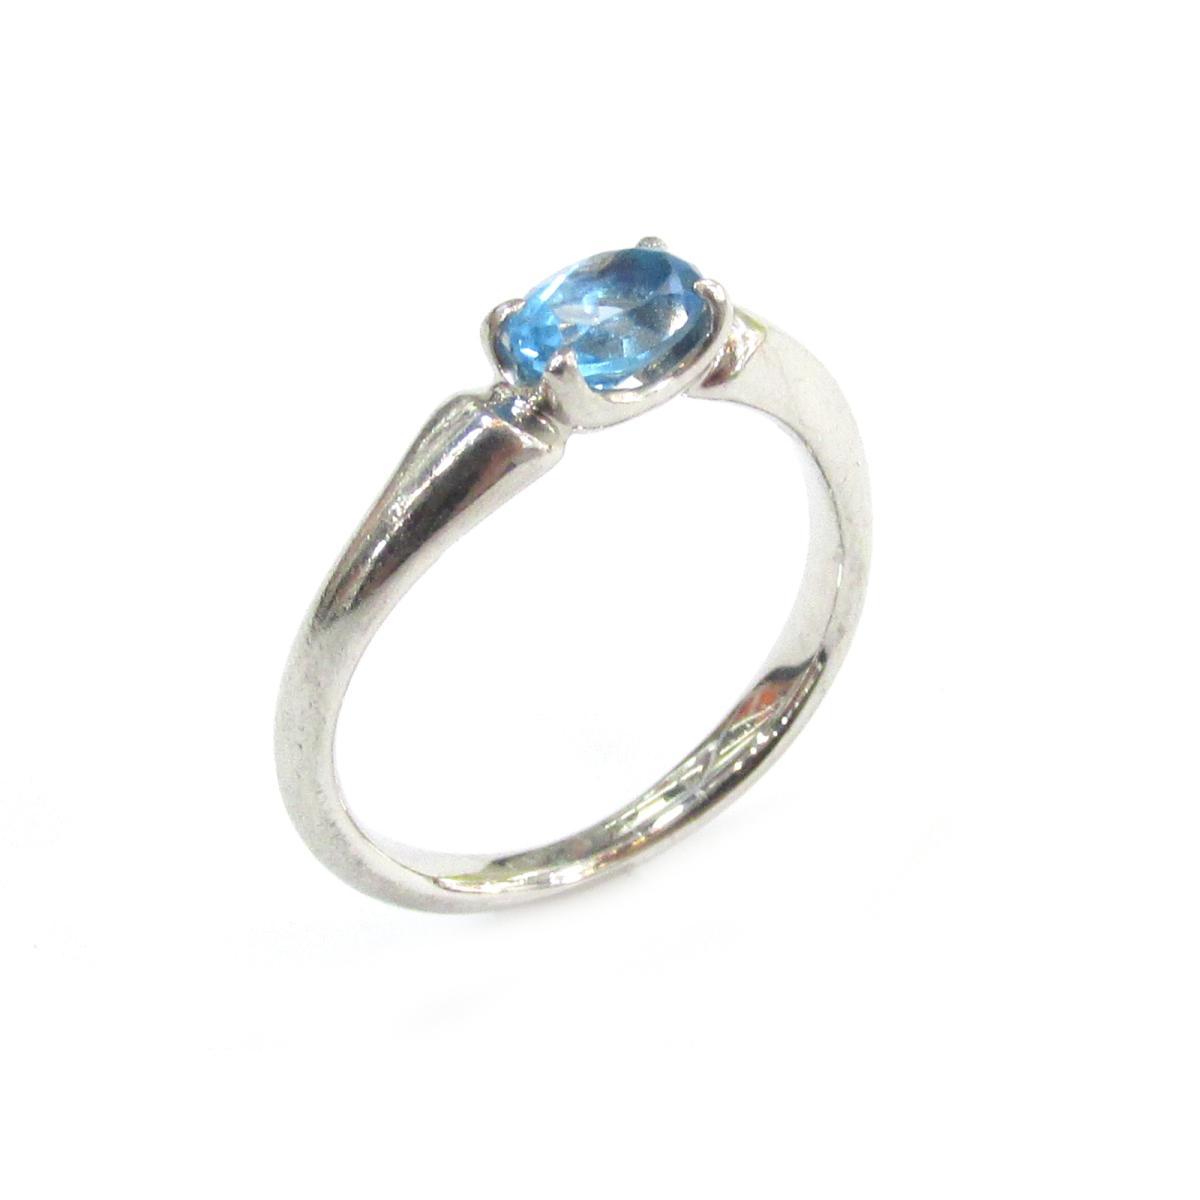 21d2fc312c89 【中古】ヨンドシーアクアマリンリング指輪ブランドジュエリーレディースPT950プラチナxアクアマリン